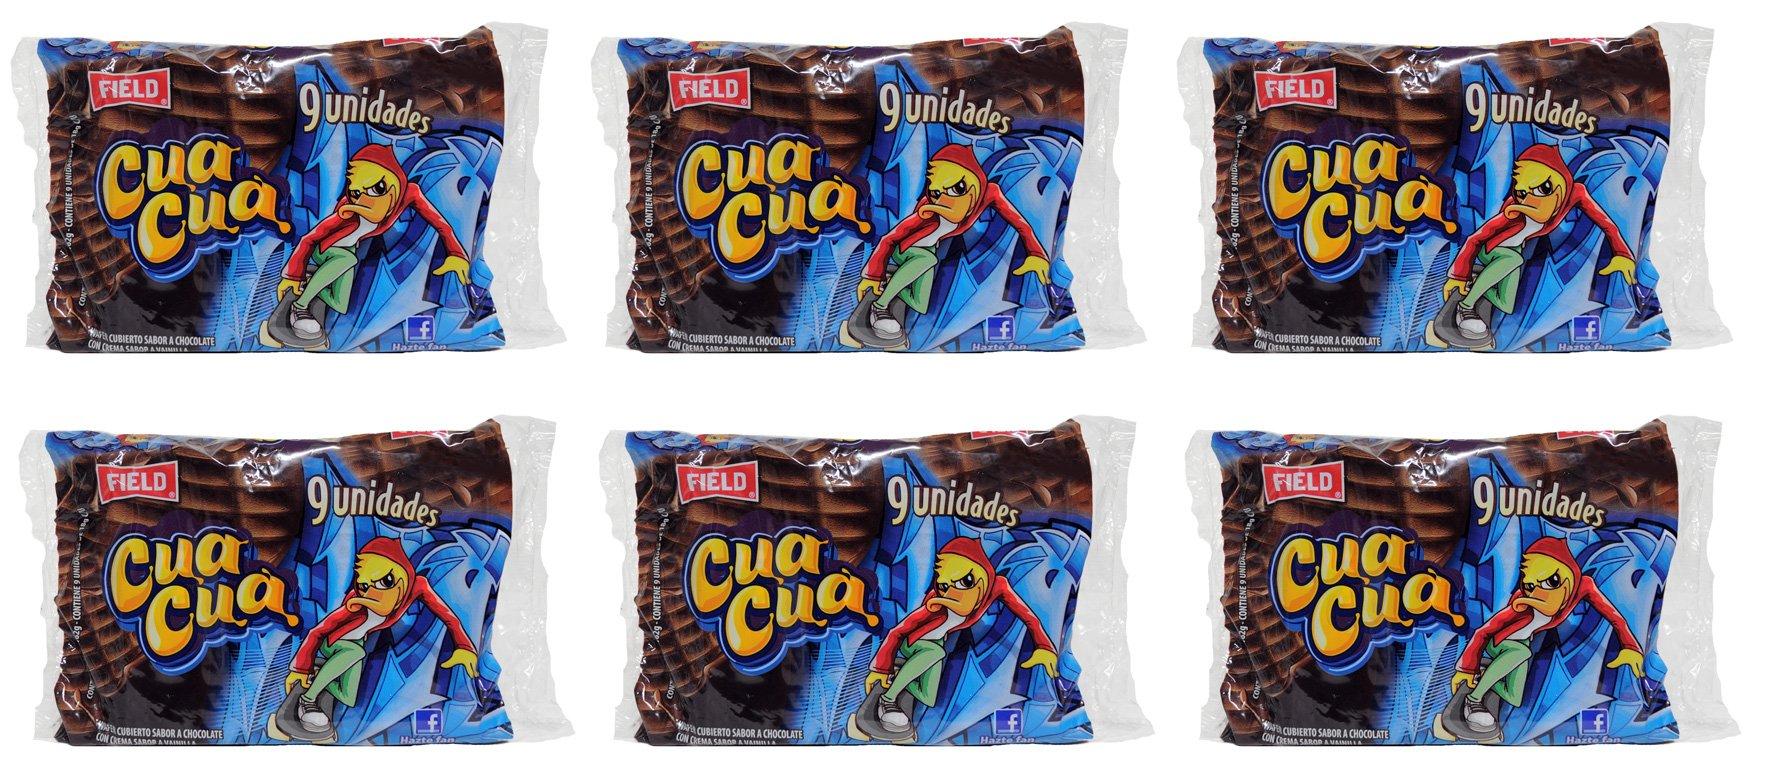 Amazon.com : Cua Cua Chocolate del Peru 6 Pack of 9 units of 162 gr each - Total 54 chocolates : Grocery & Gourmet Food